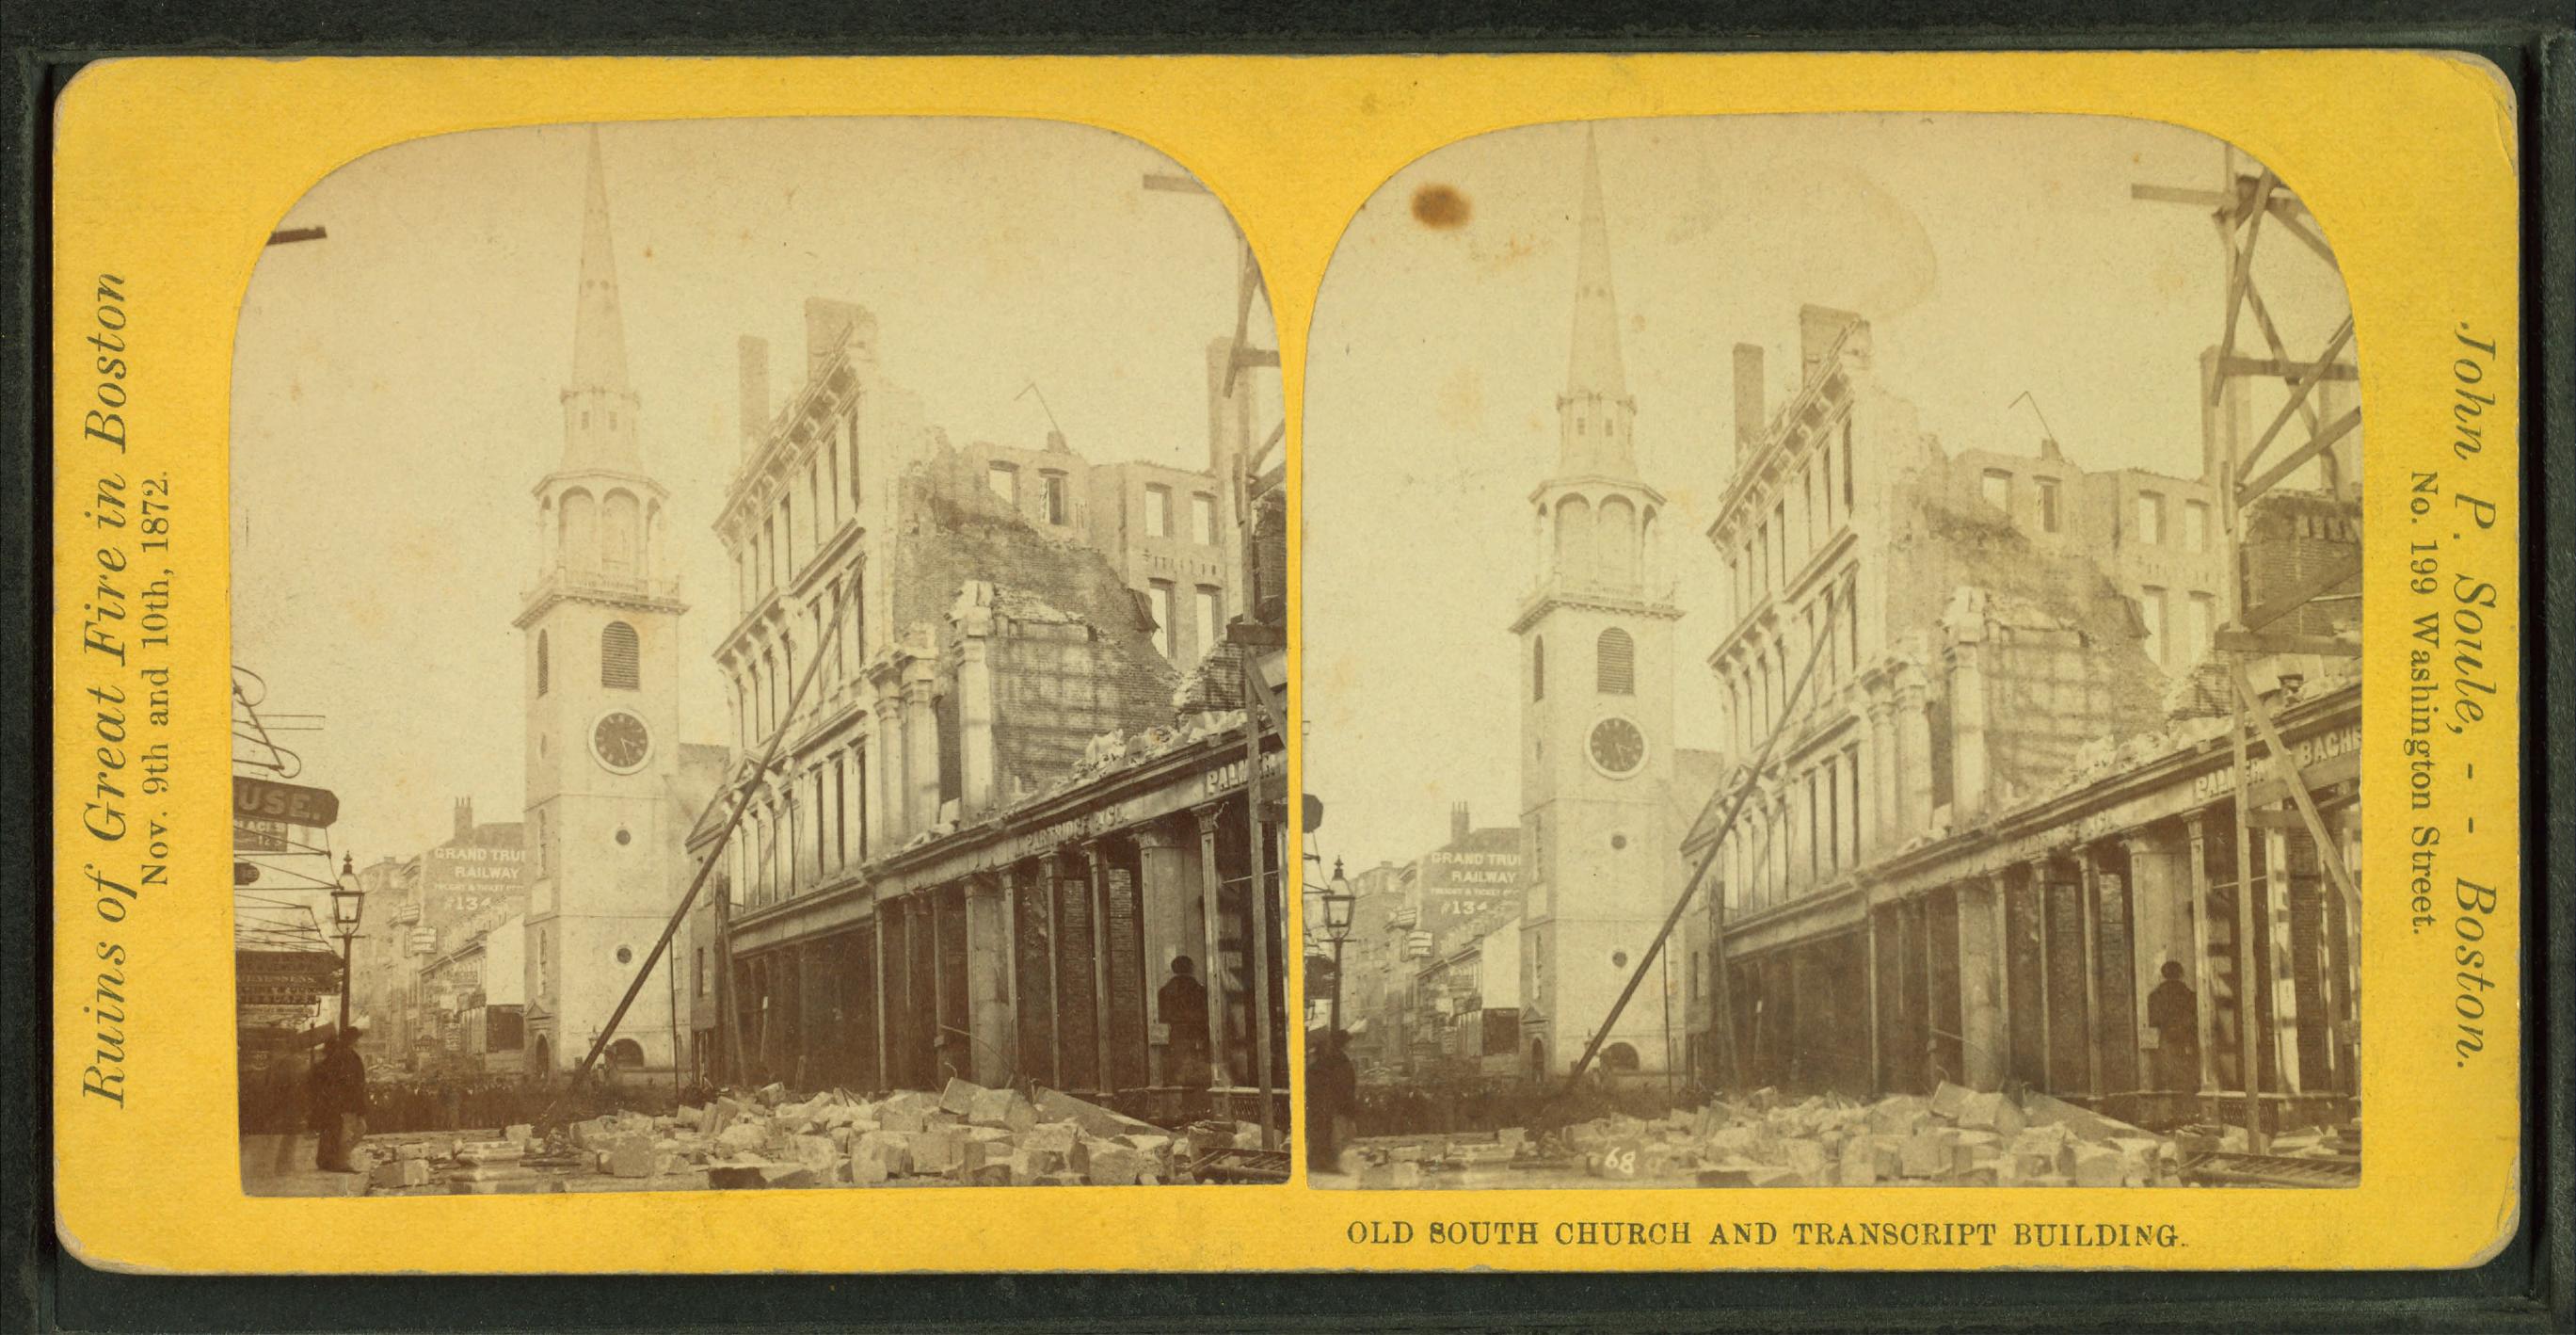 HISTORIC BOSTON FIRE FROM WASHINGTON STREET SOUTH CHURCH TRANSCRIPT BUILDING